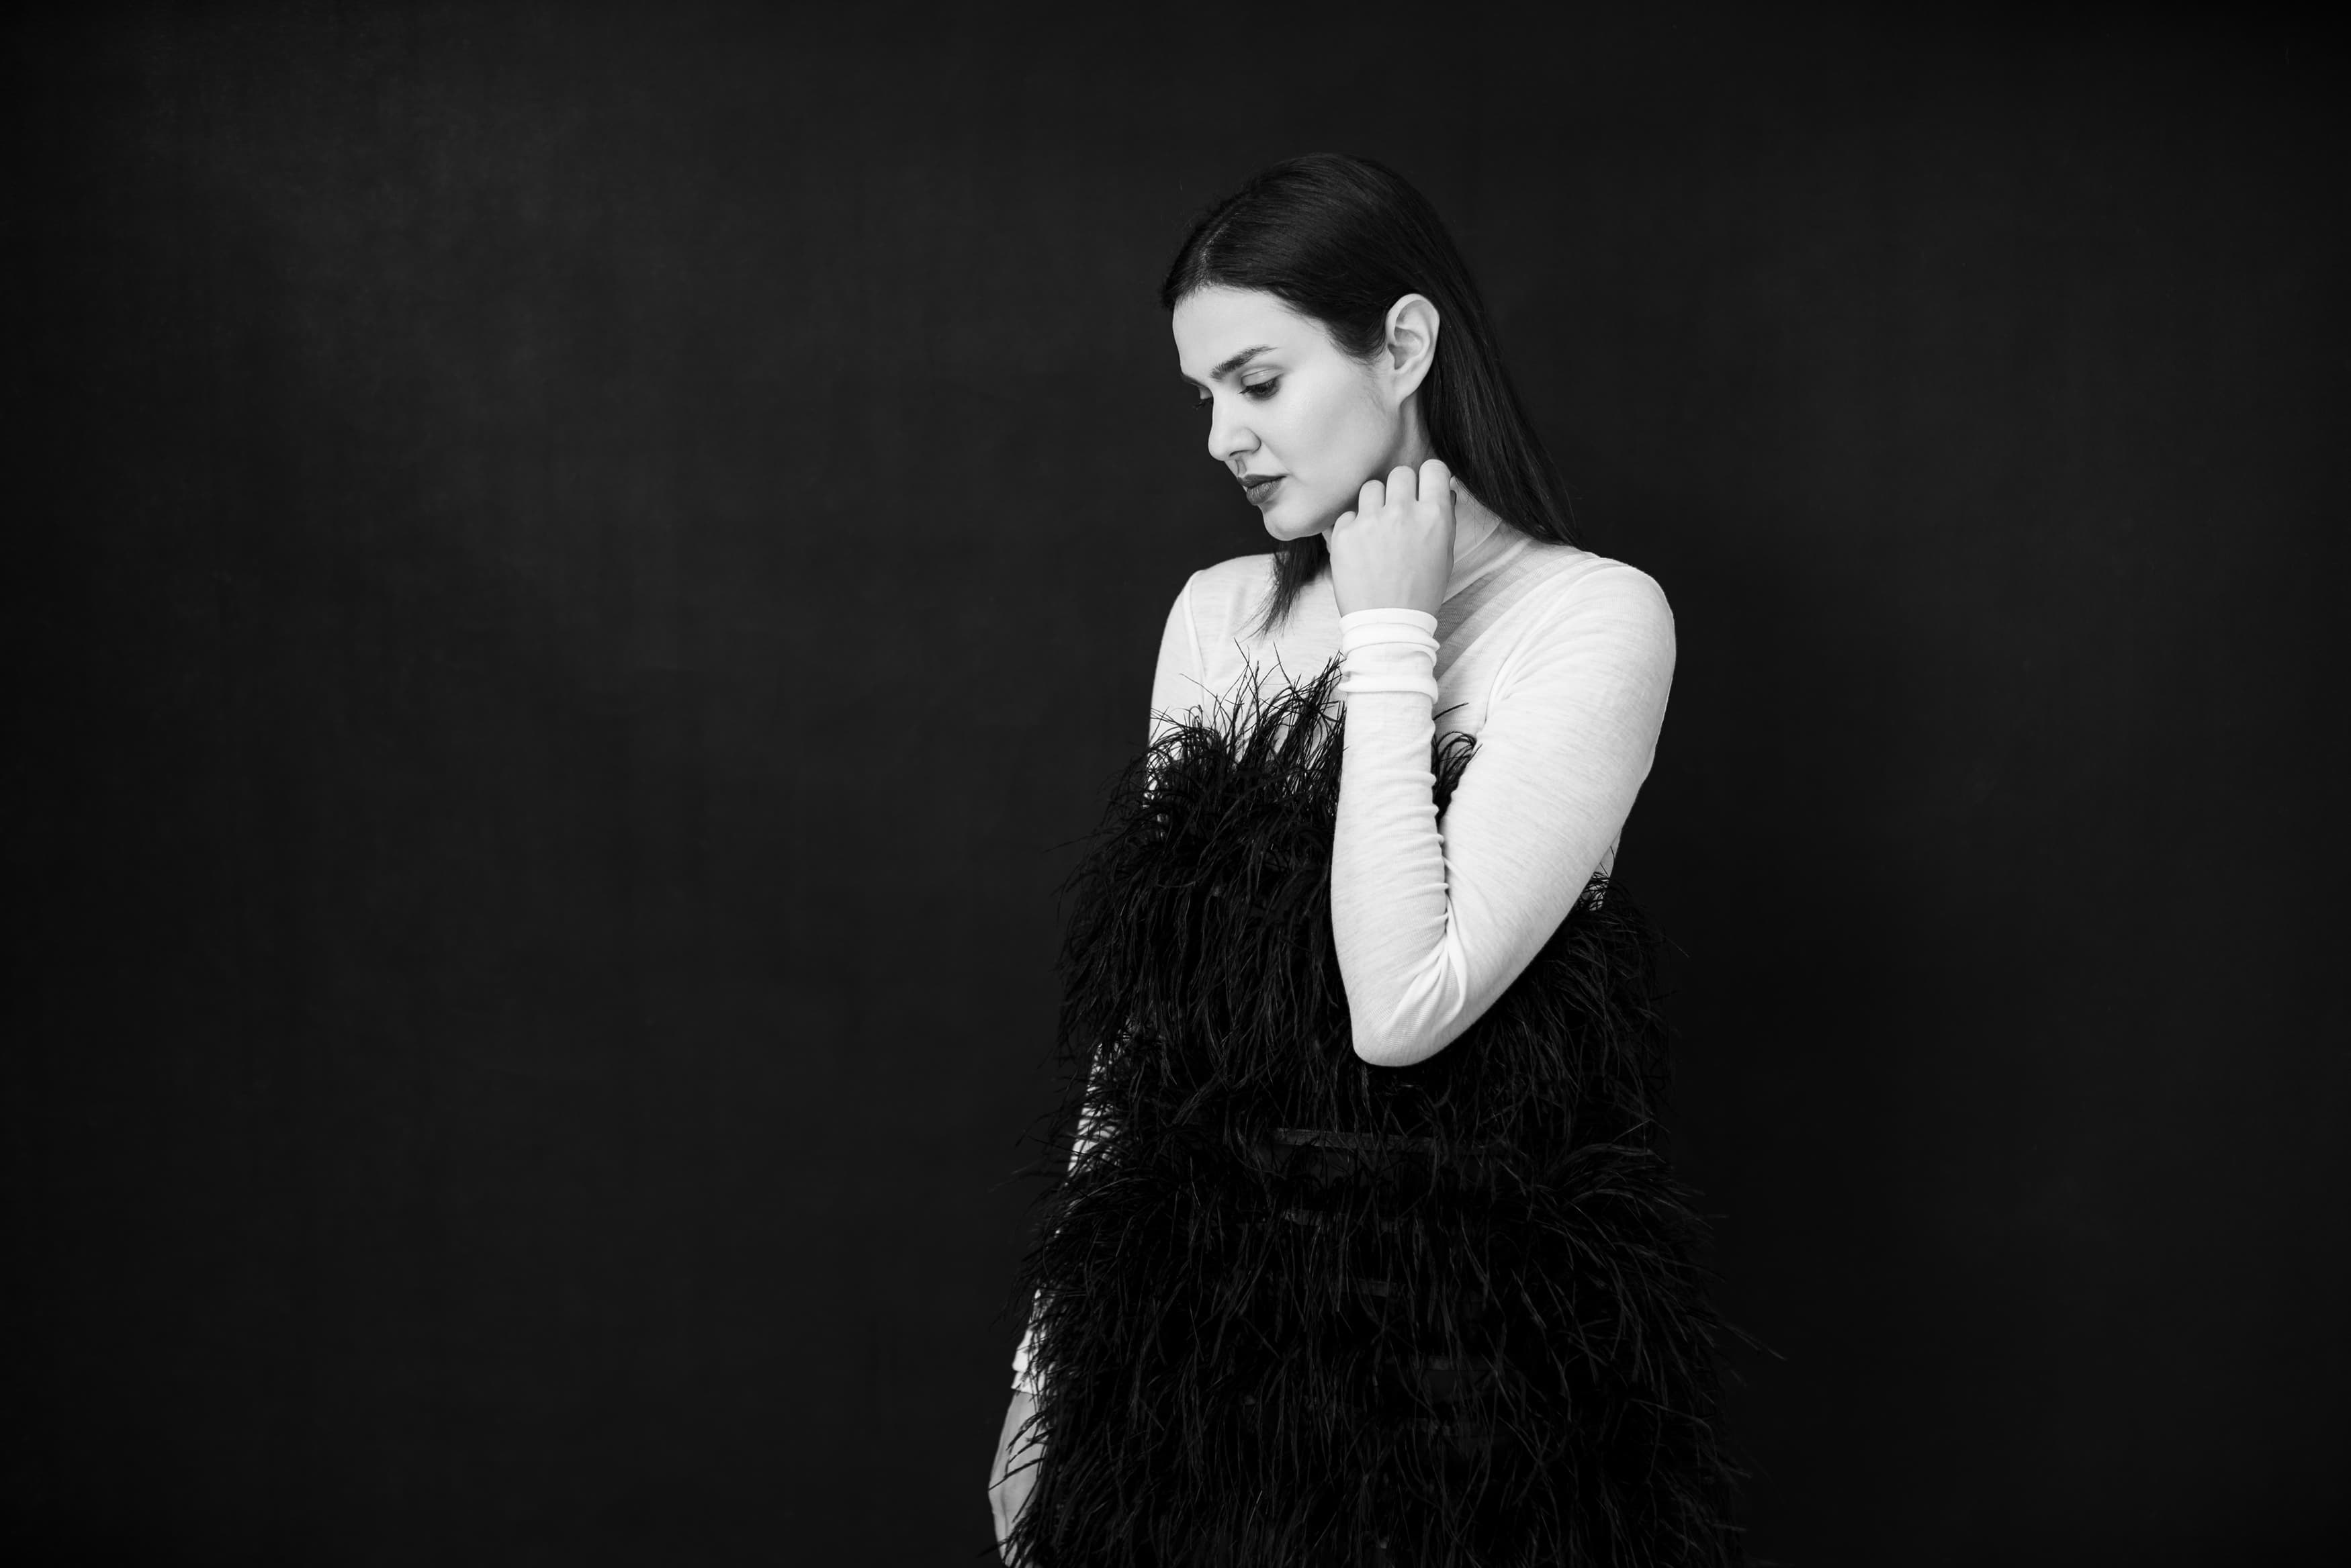 Mara Coman @Harper's Bazaar x The Woman 4